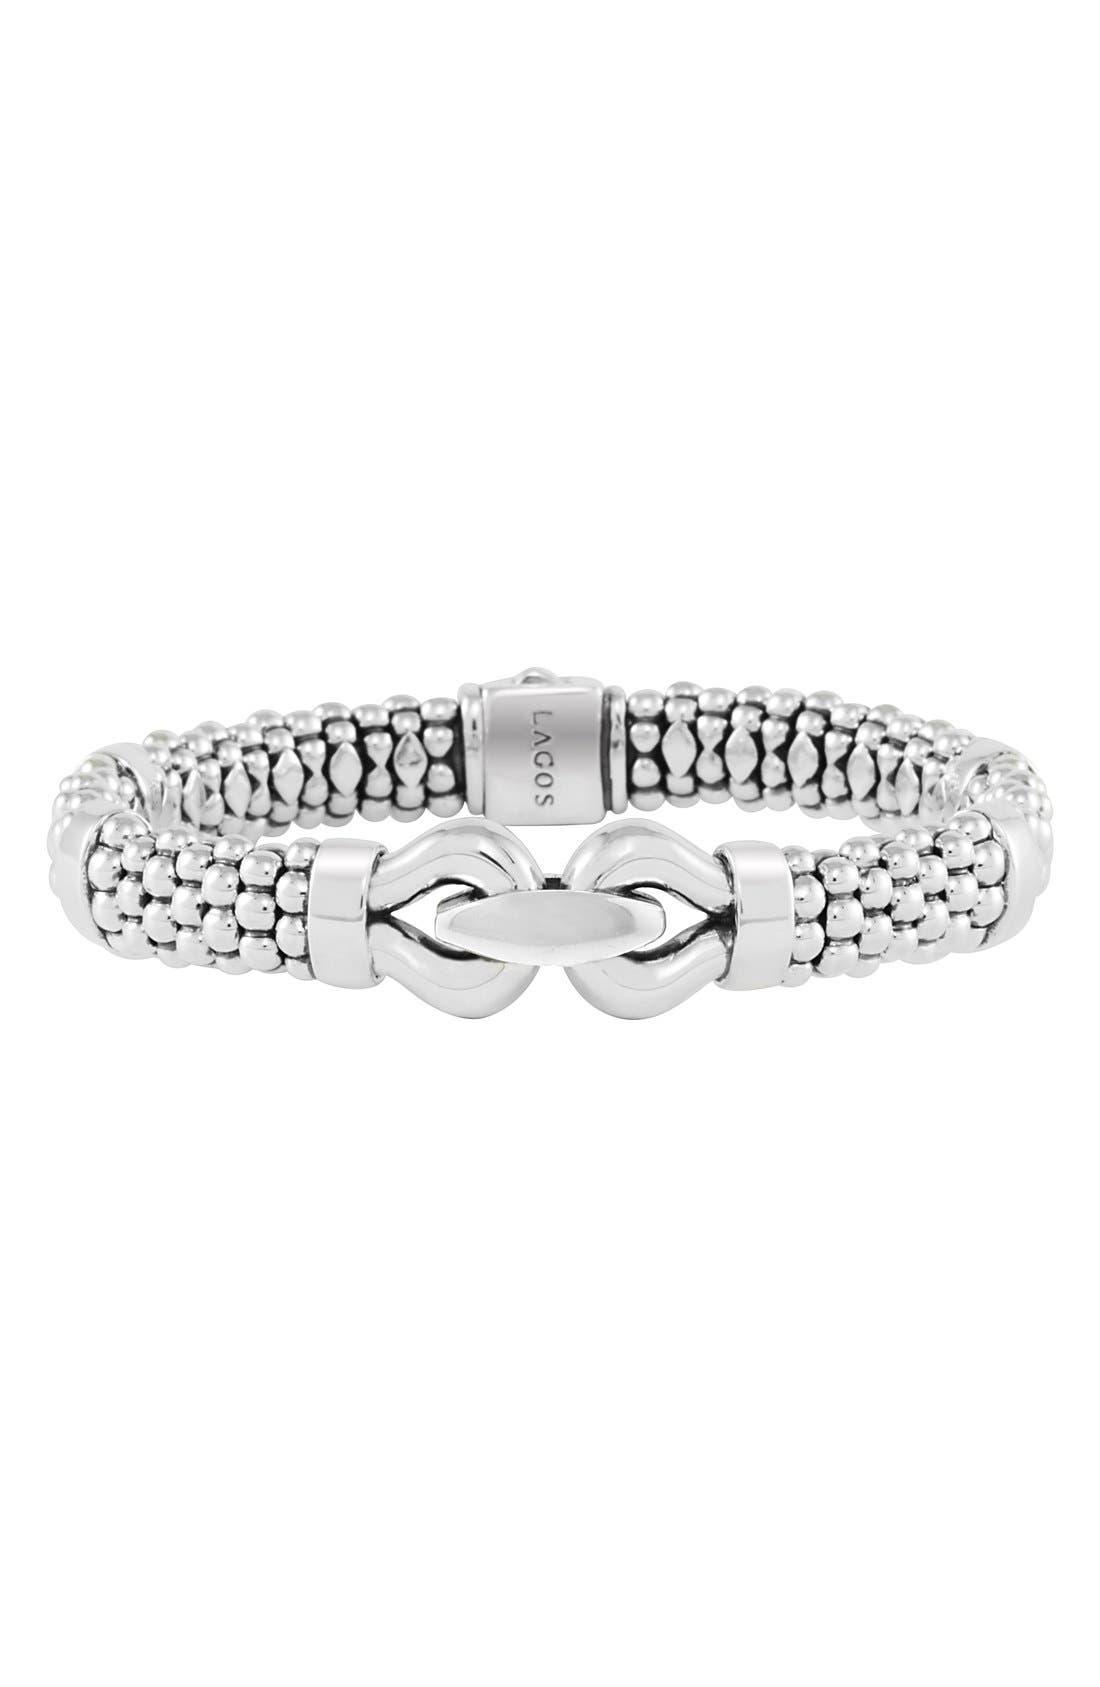 Main Image - LAGOS 'Derby' Caviar Rope Bracelet